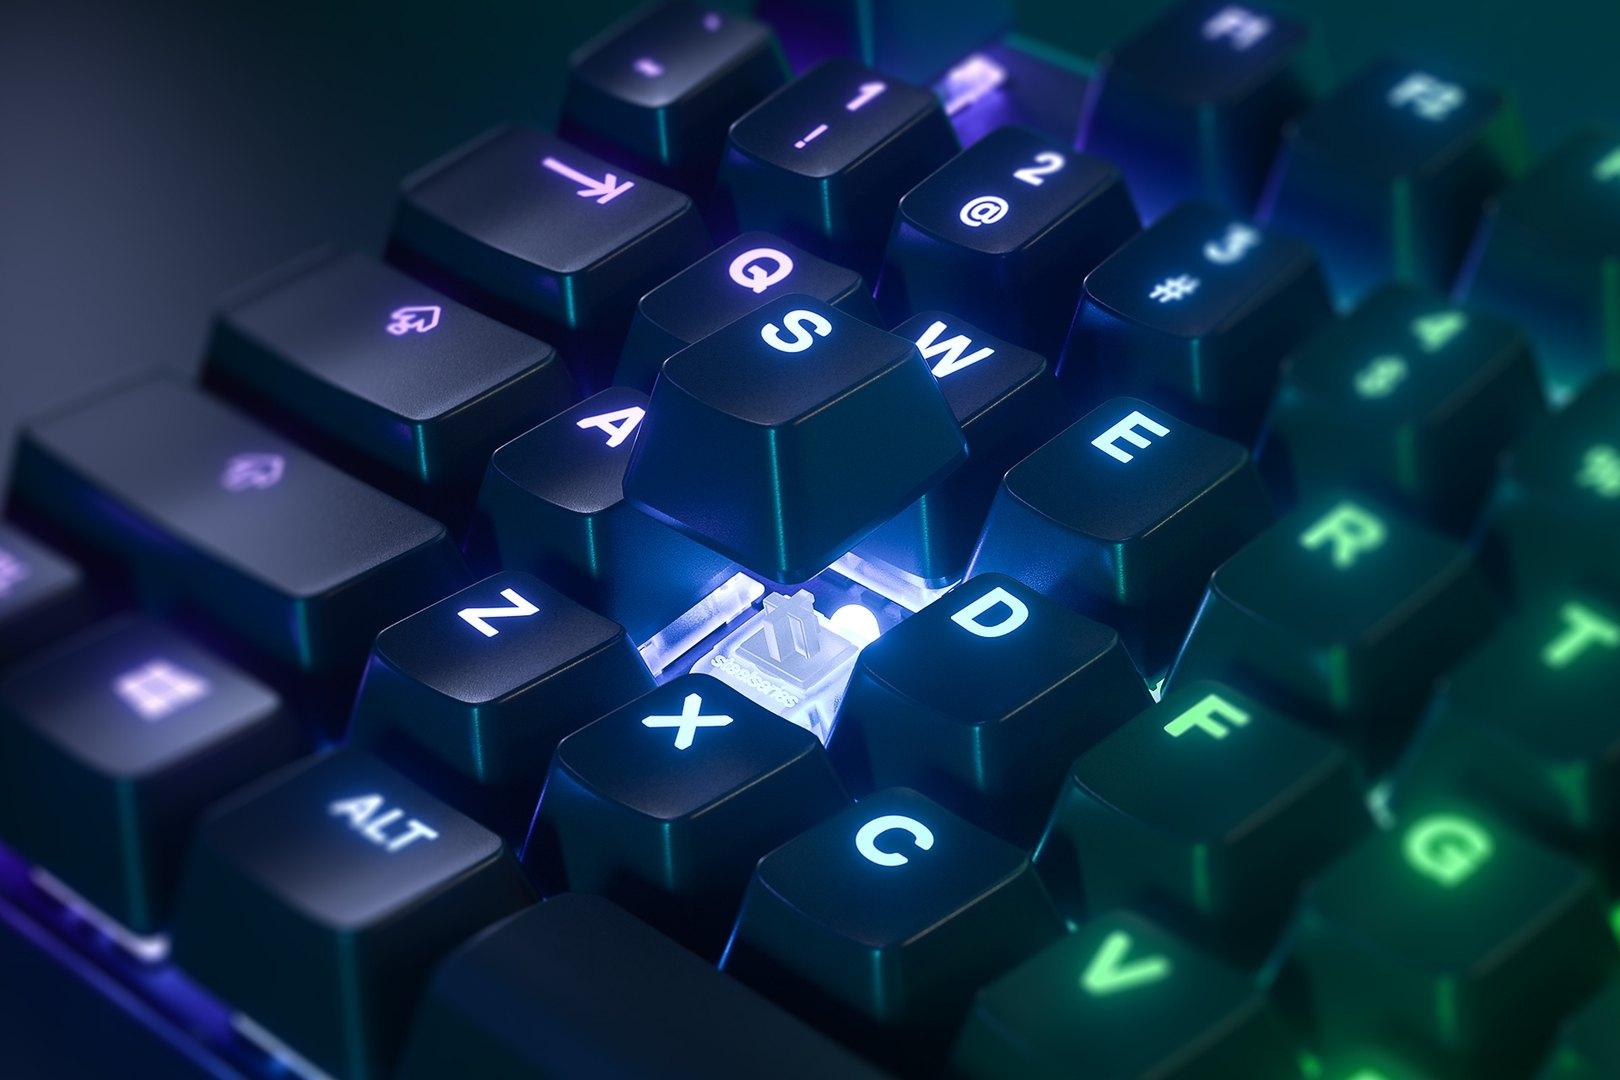 Apex Pro OmniPoint keys